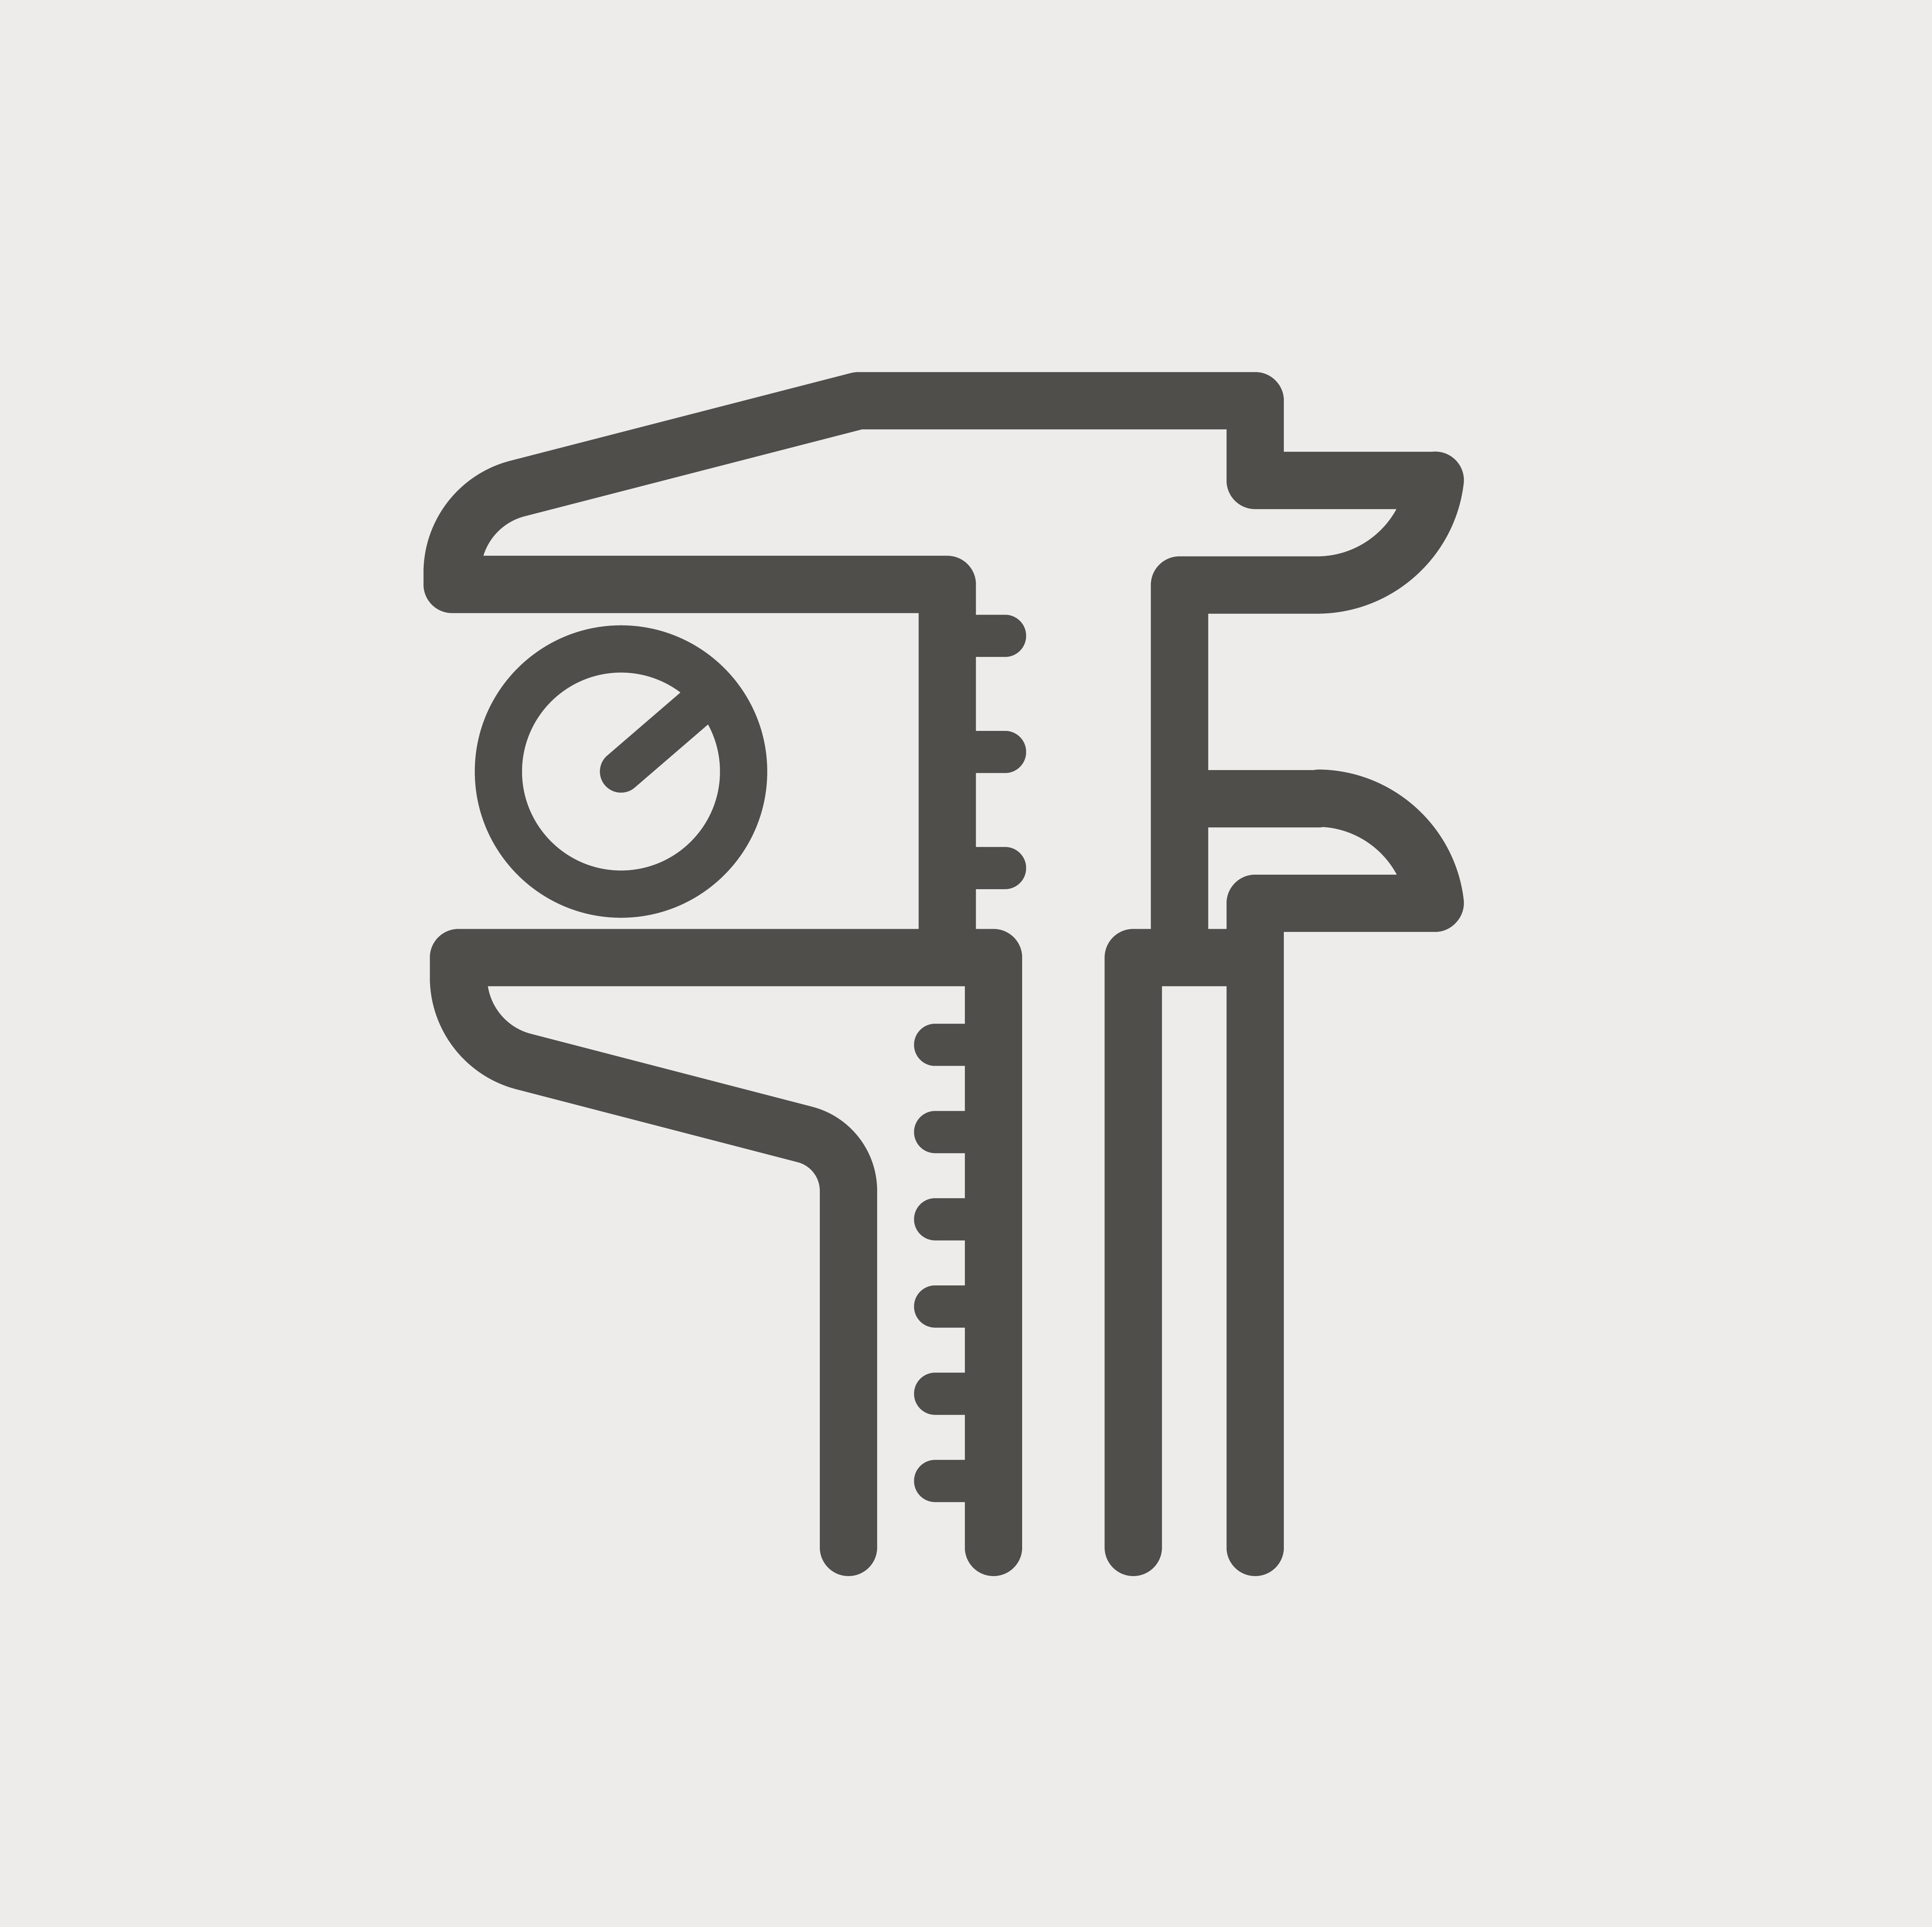 Elektro Pilger - Planung und Beratung